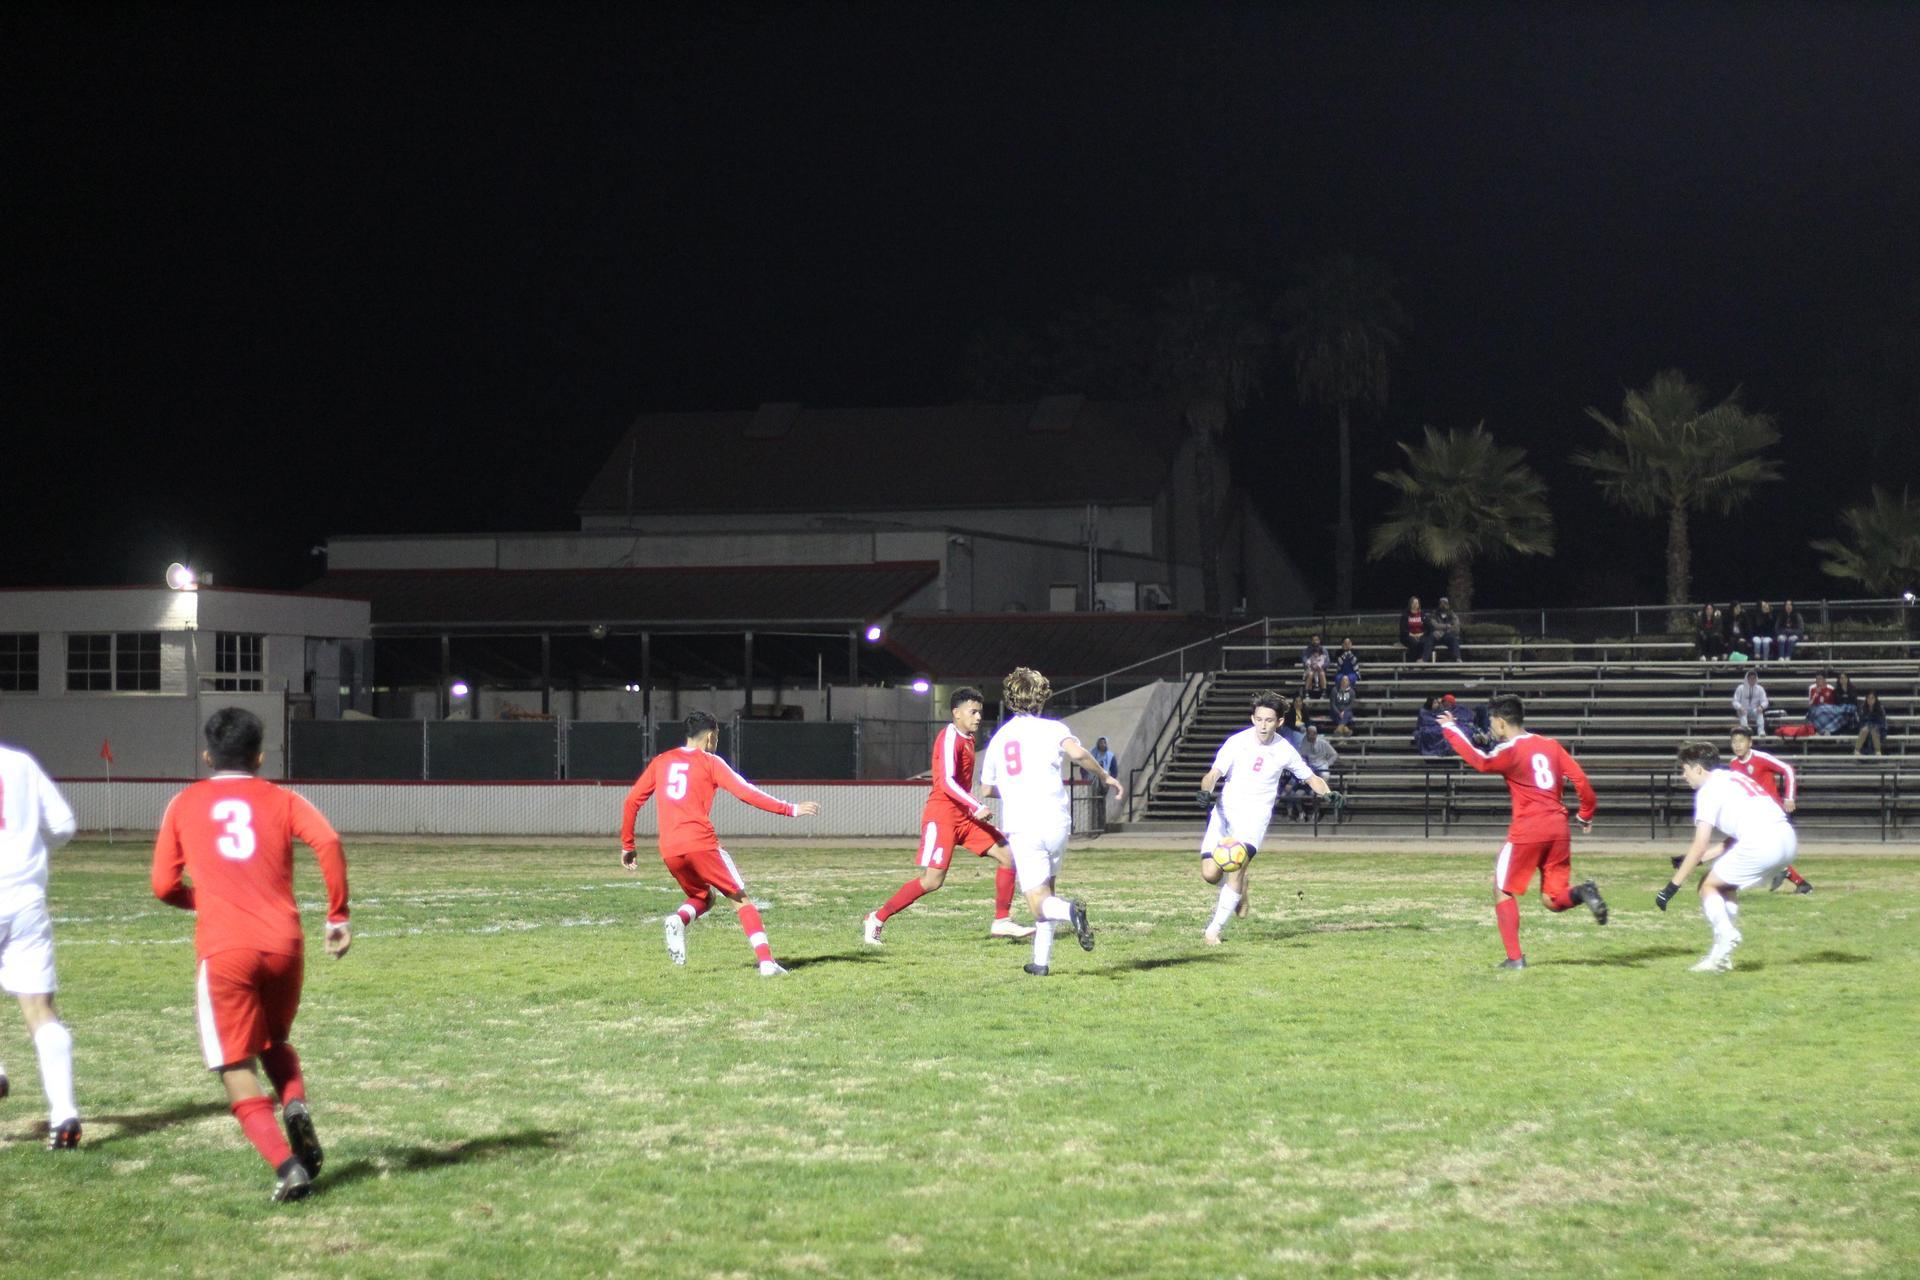 Antonio Ochoa, Edgar Campos, and Favian Casillas going after the ball